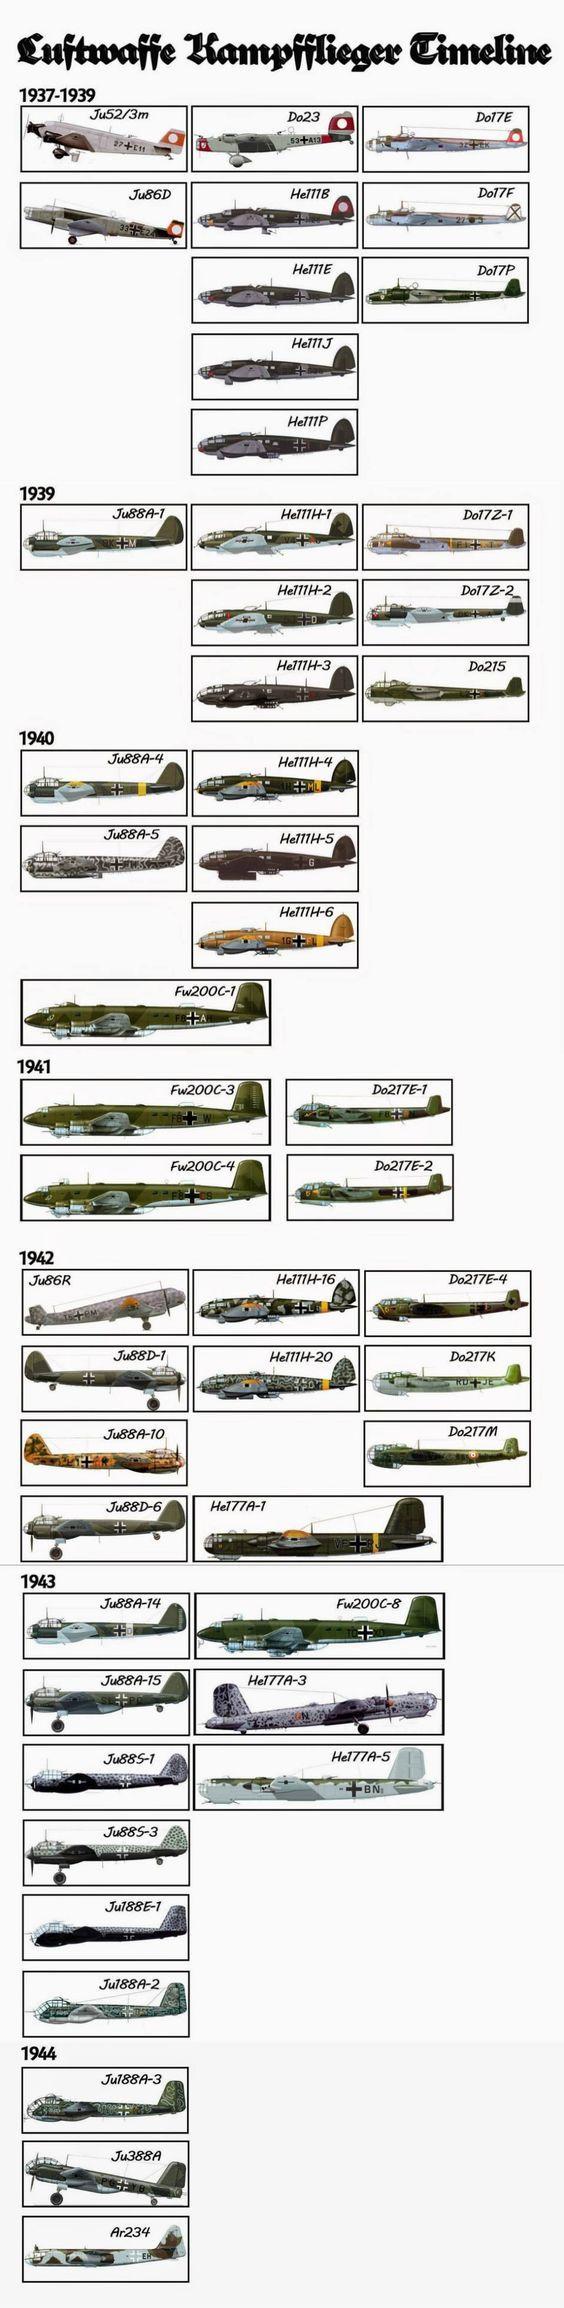 Luftwaffe aircraft timeline – Bernd Metzger